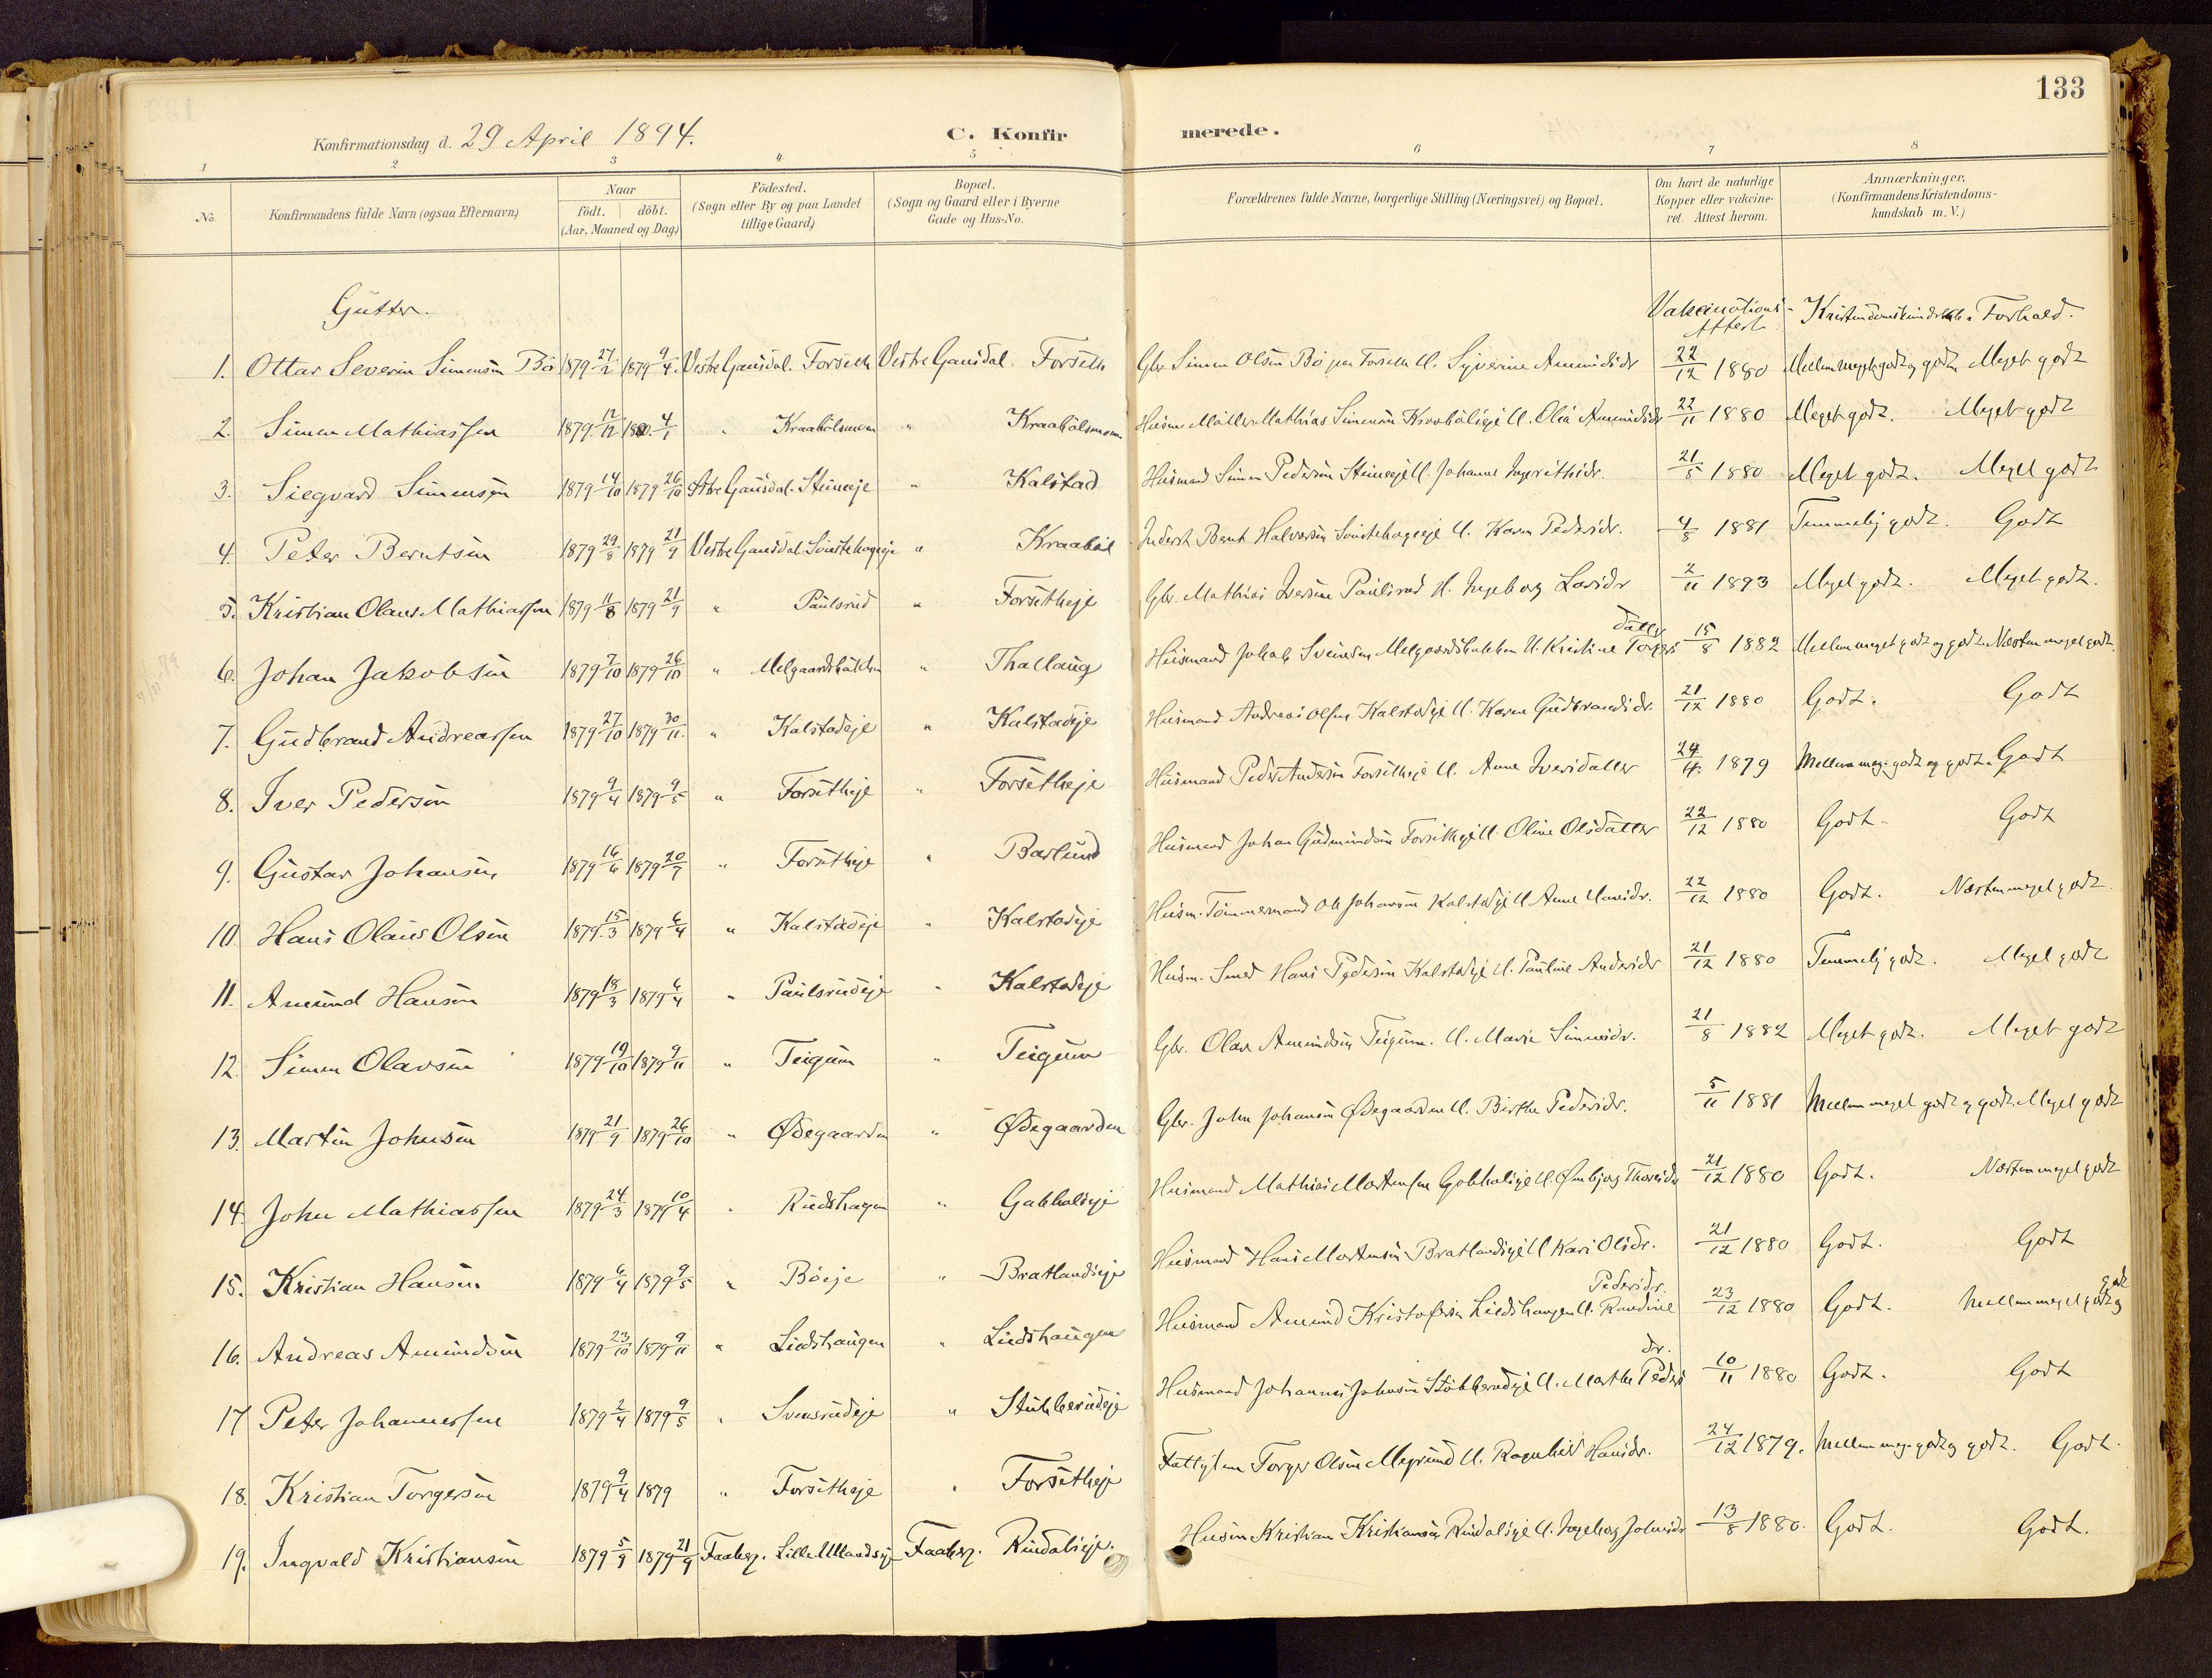 SAH, Vestre Gausdal prestekontor, Ministerialbok nr. 1, 1887-1914, s. 133